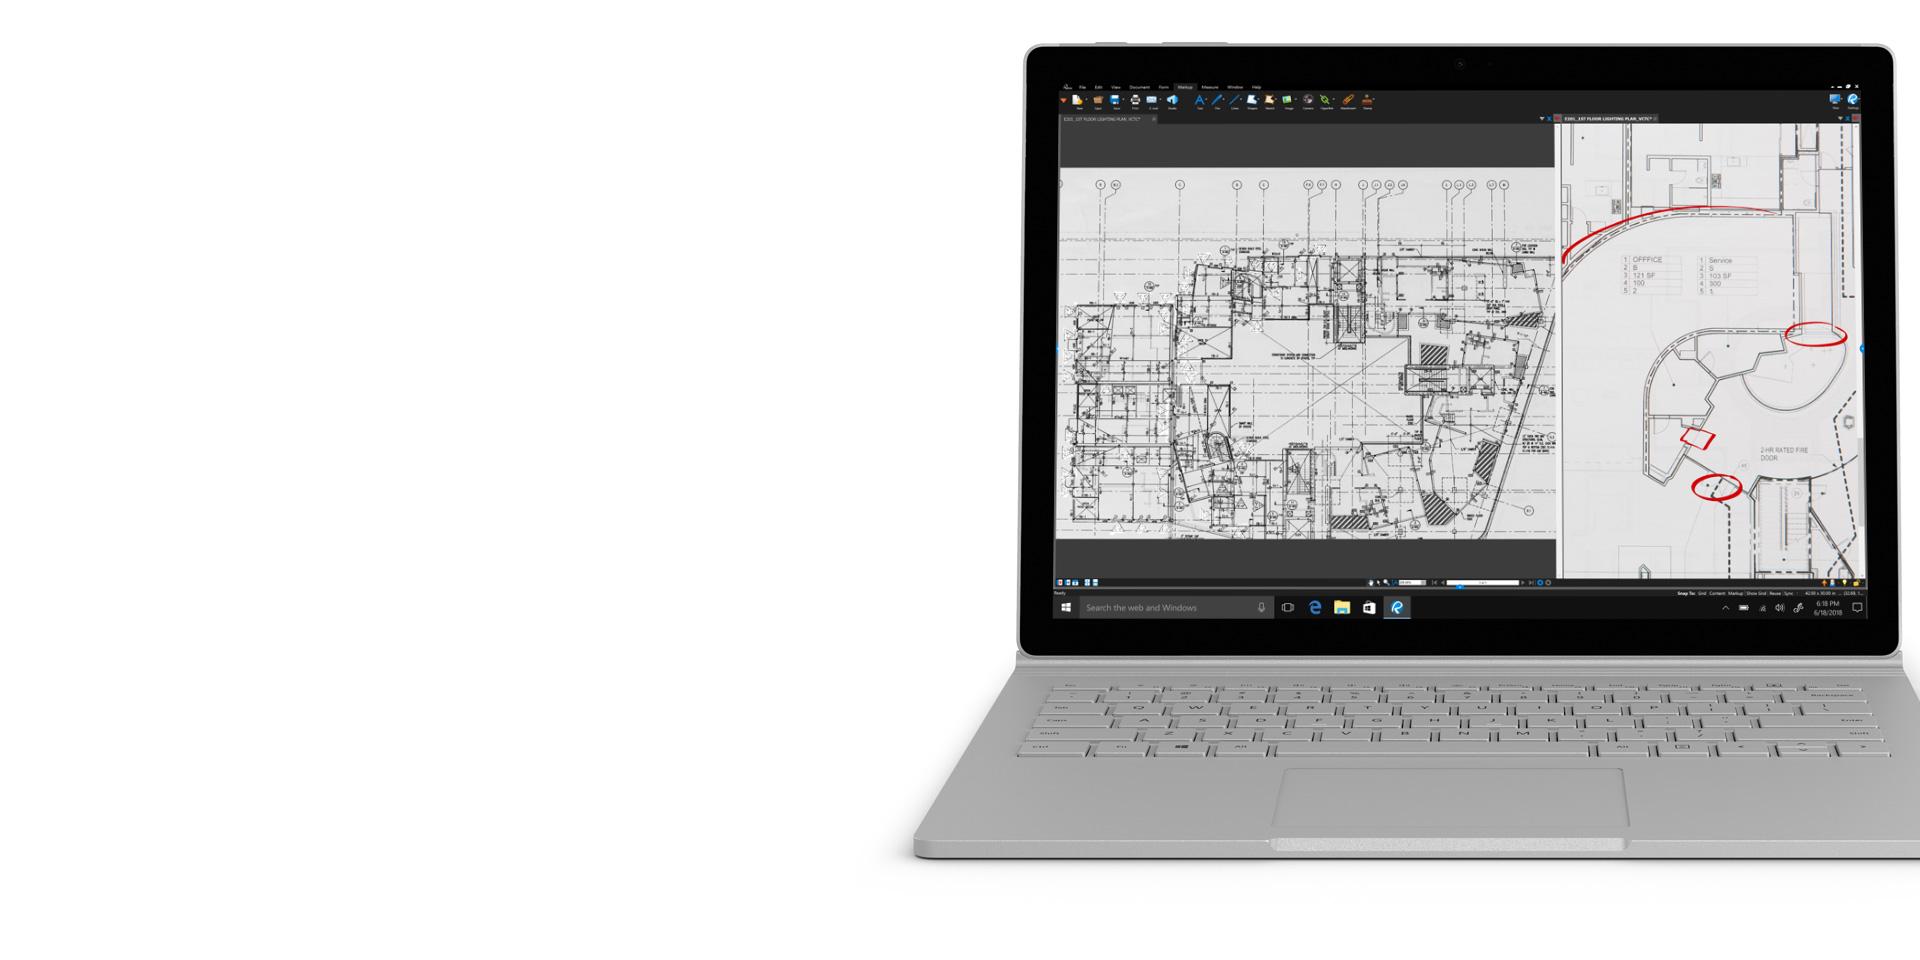 Paparan Bluebeam pada Surface Book 2